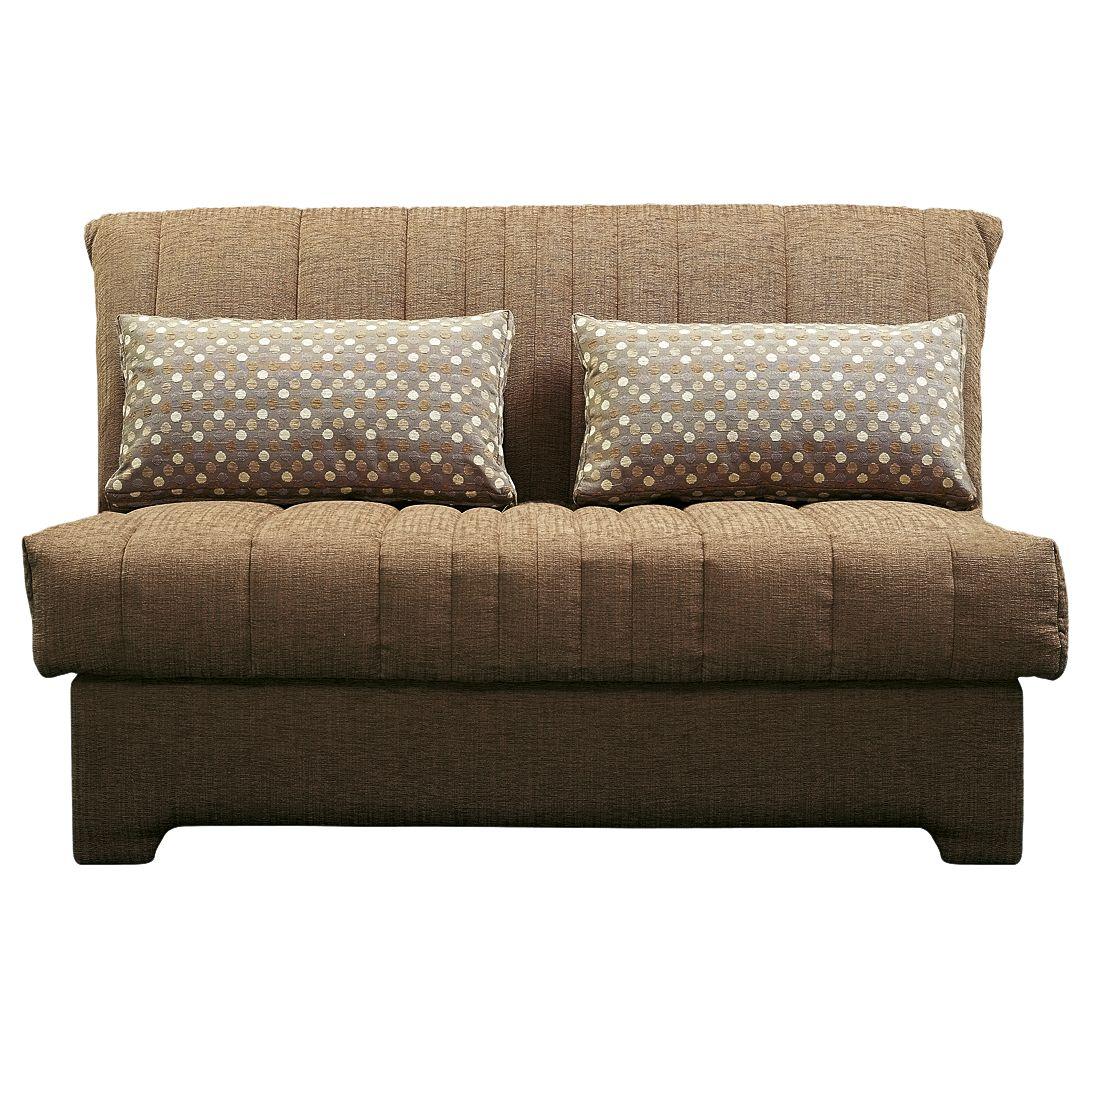 Bolero Sofa Bed John Lewis Scandlecandlecom